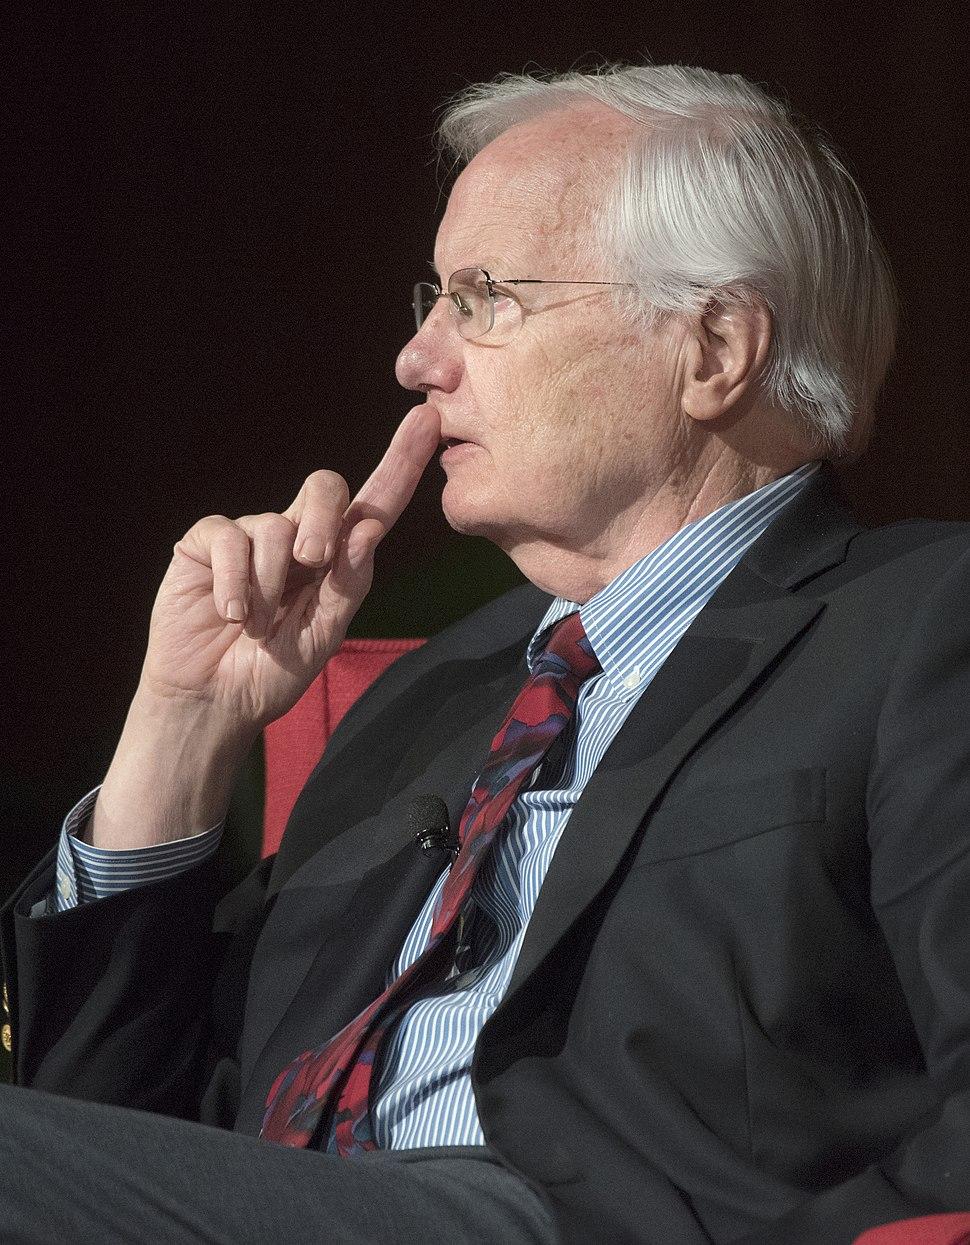 Bill Moyers 2018 (DIG14317-054)